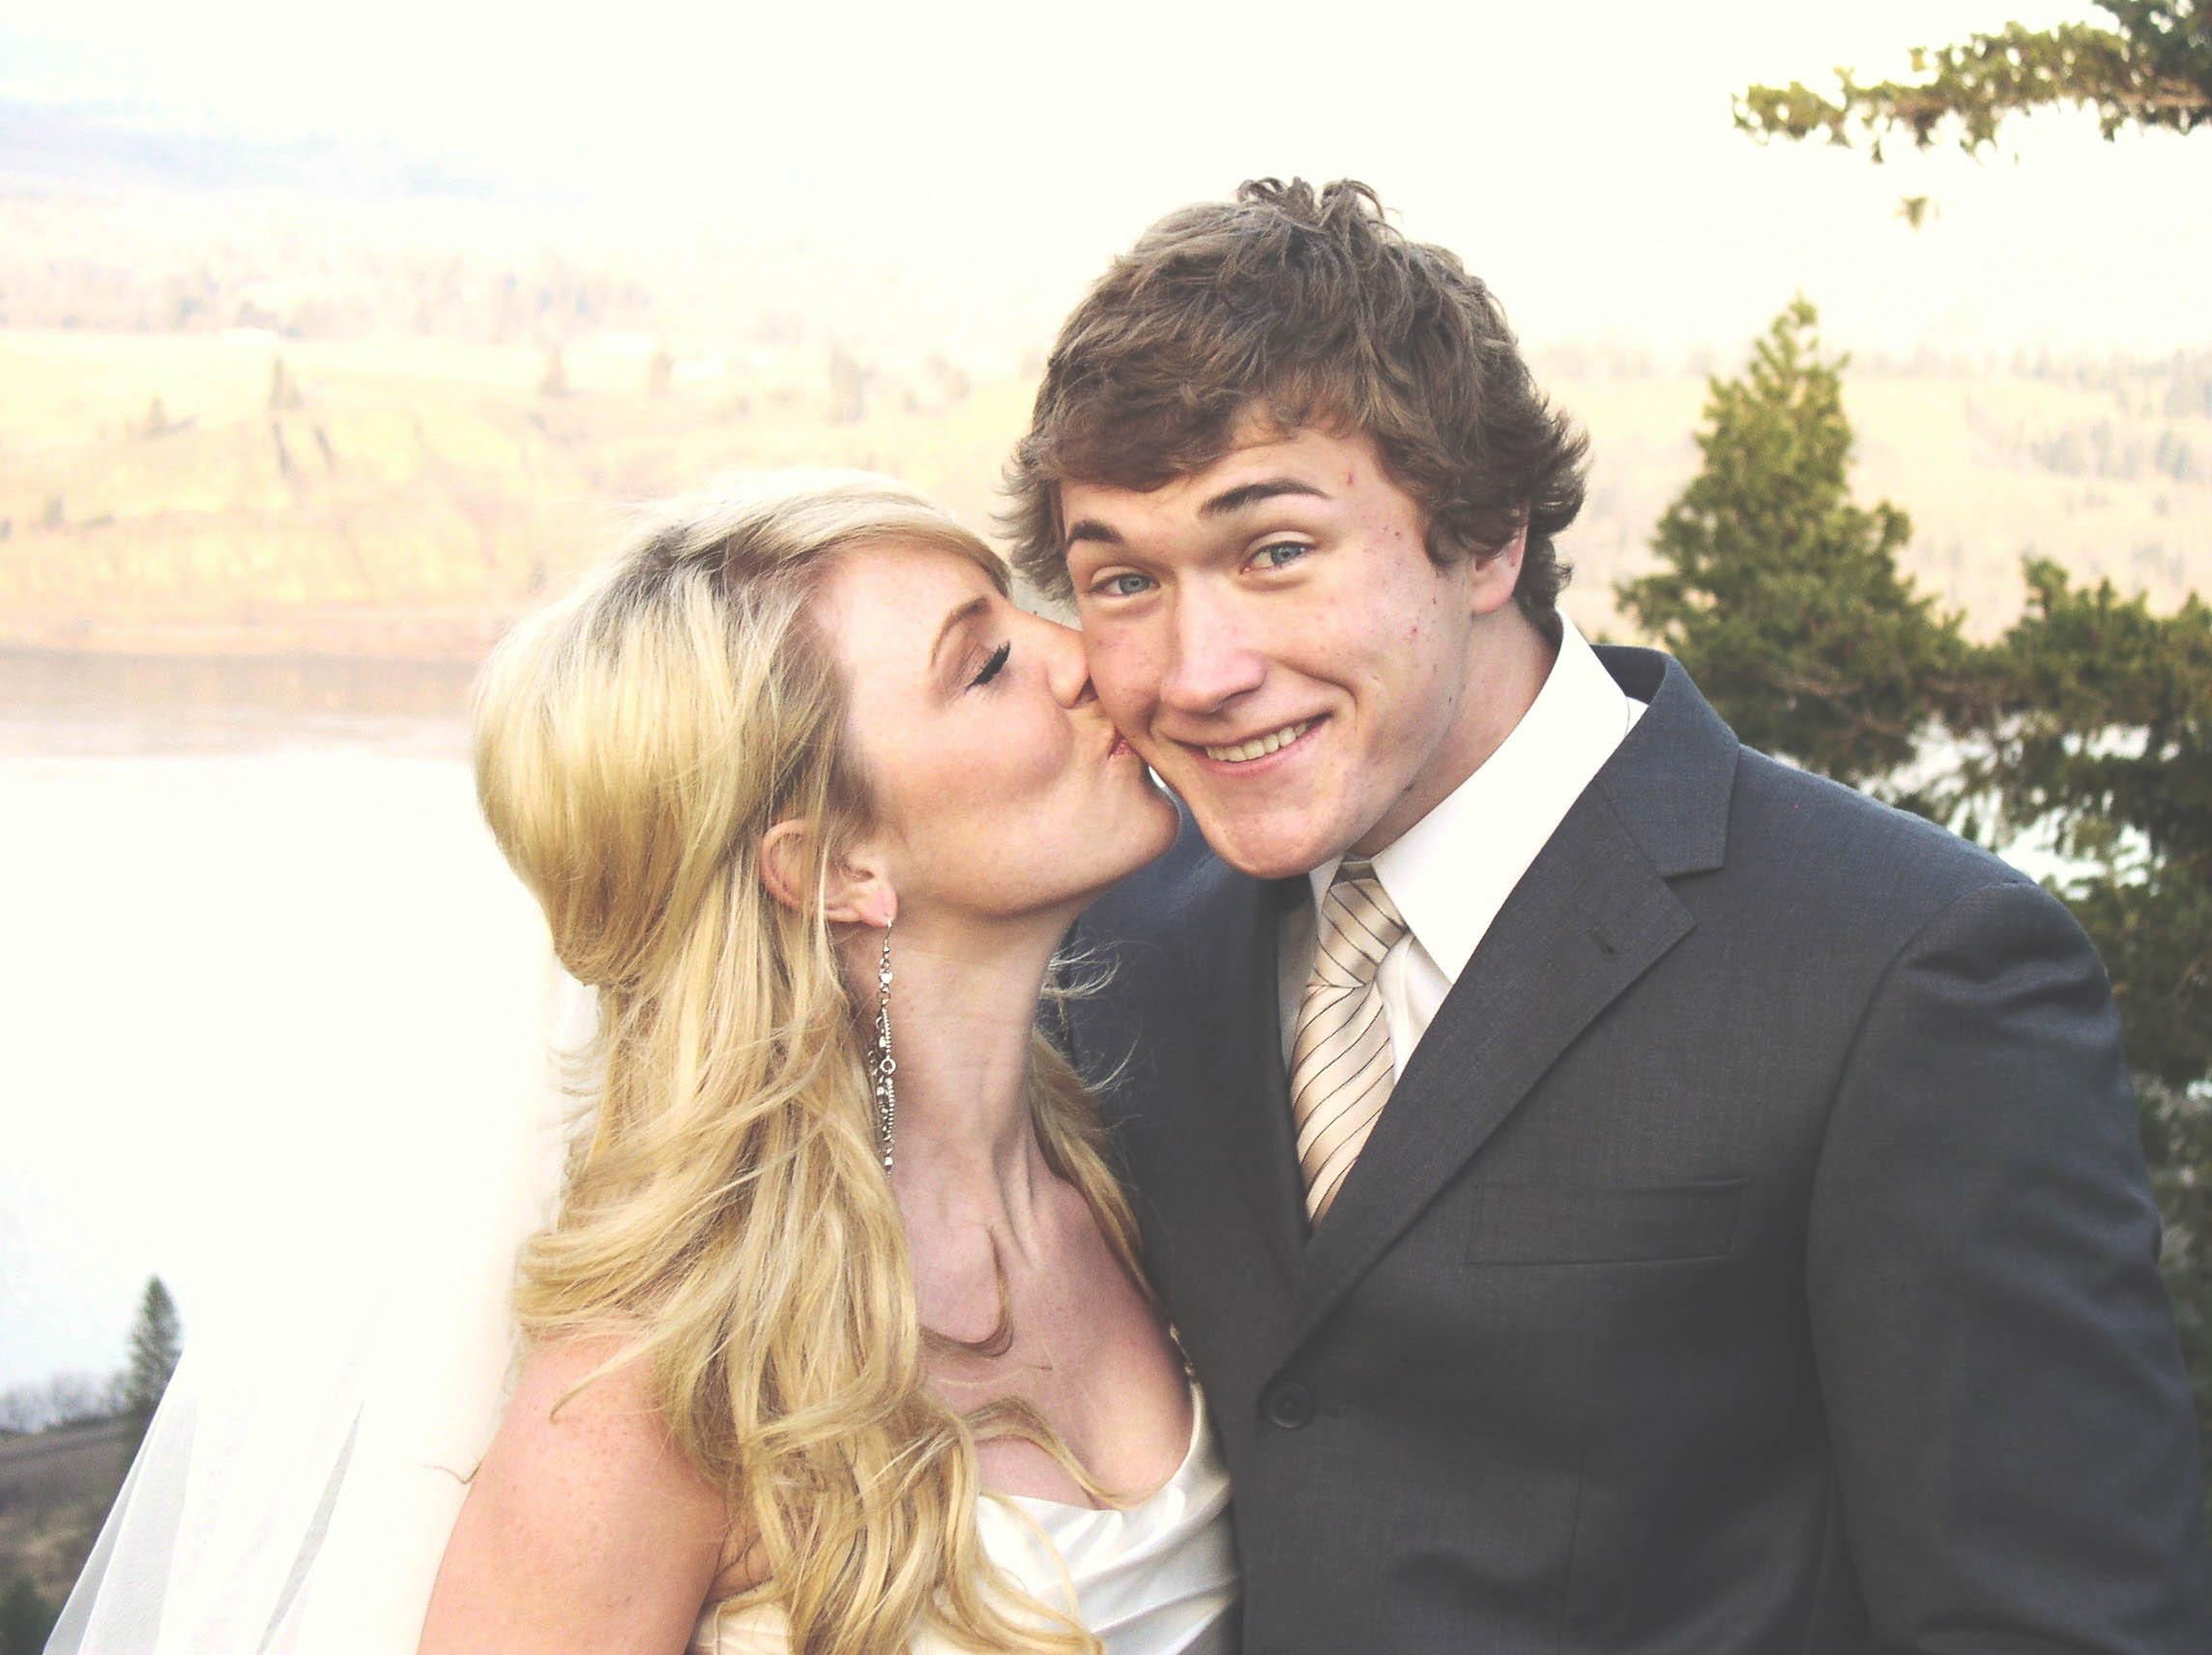 Josh + Anna || Columbia River Gorge Bridal Shoot